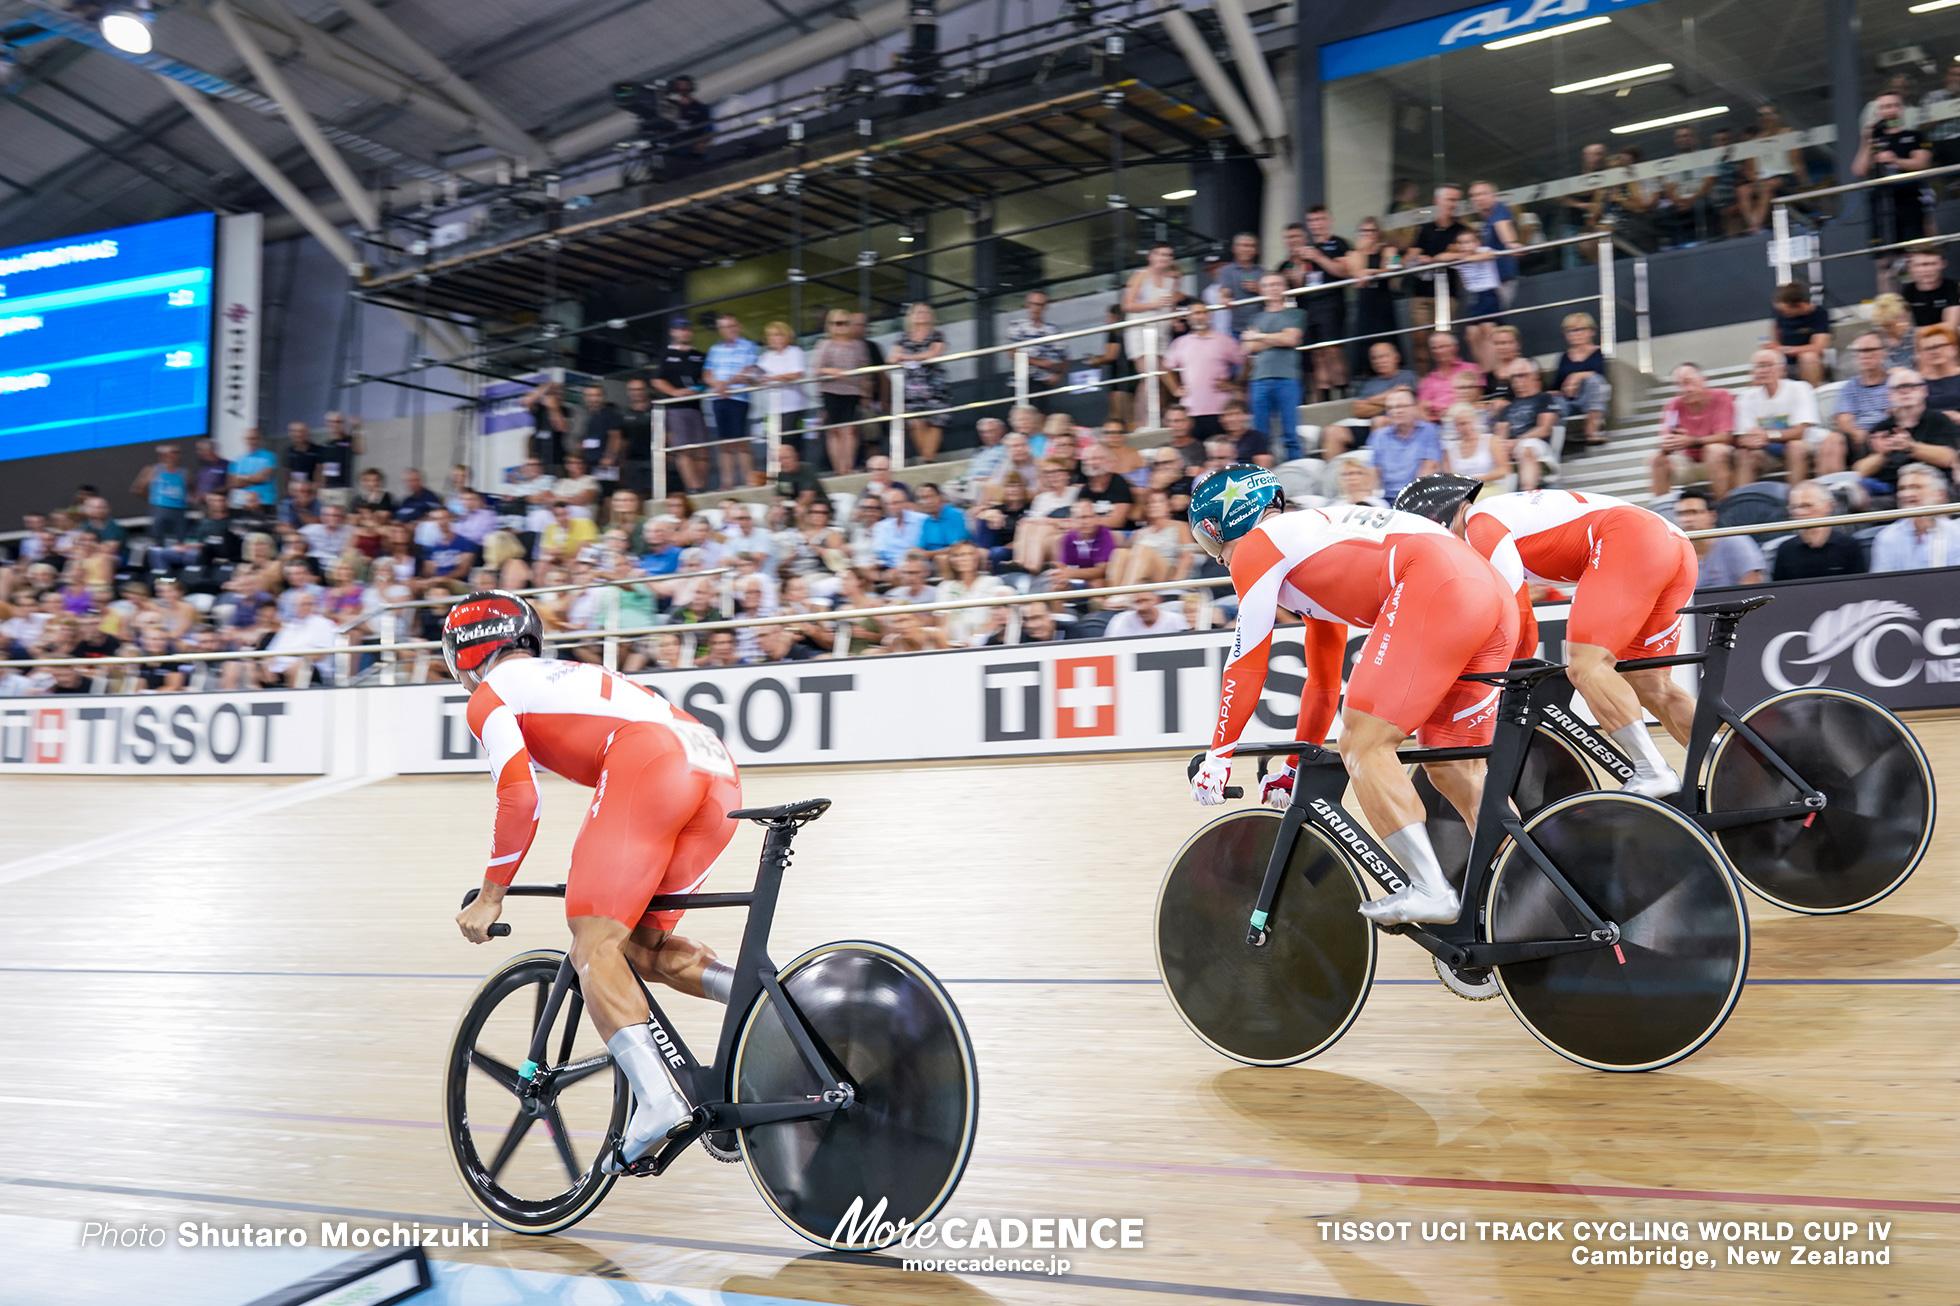 Final / Men's Team Sprint / TISSOT UCI TRACK CYCLING WORLD CUP IV, Cambridge, New Zealand